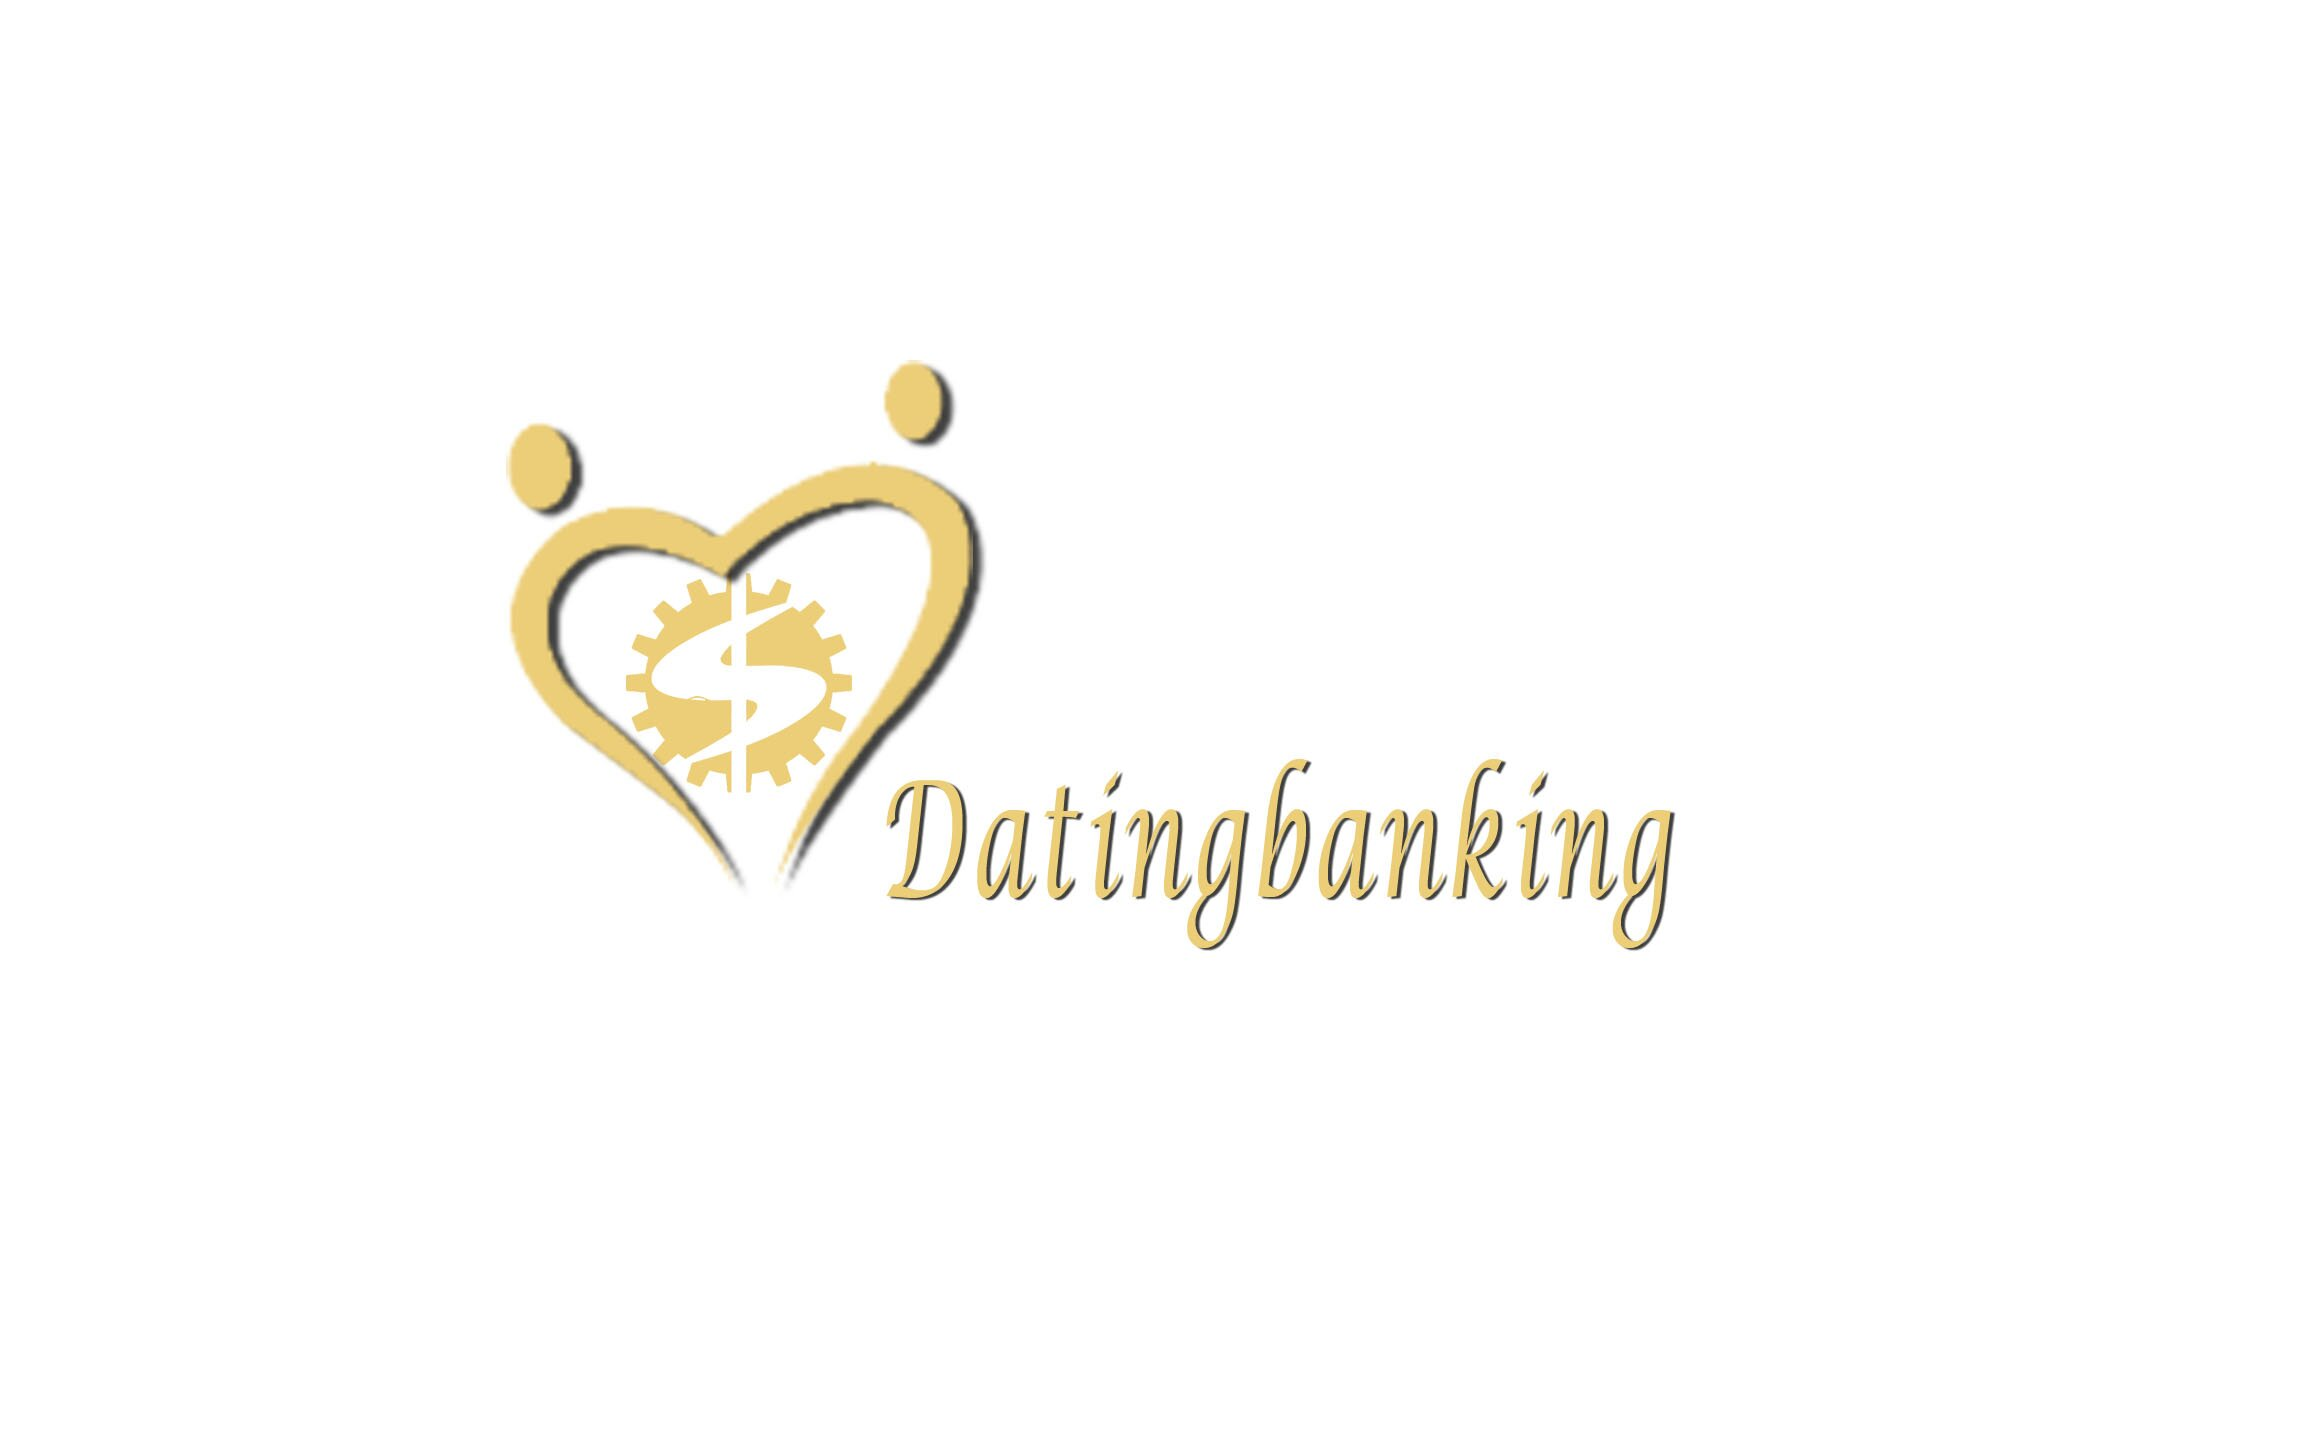 Ron Livingston dating